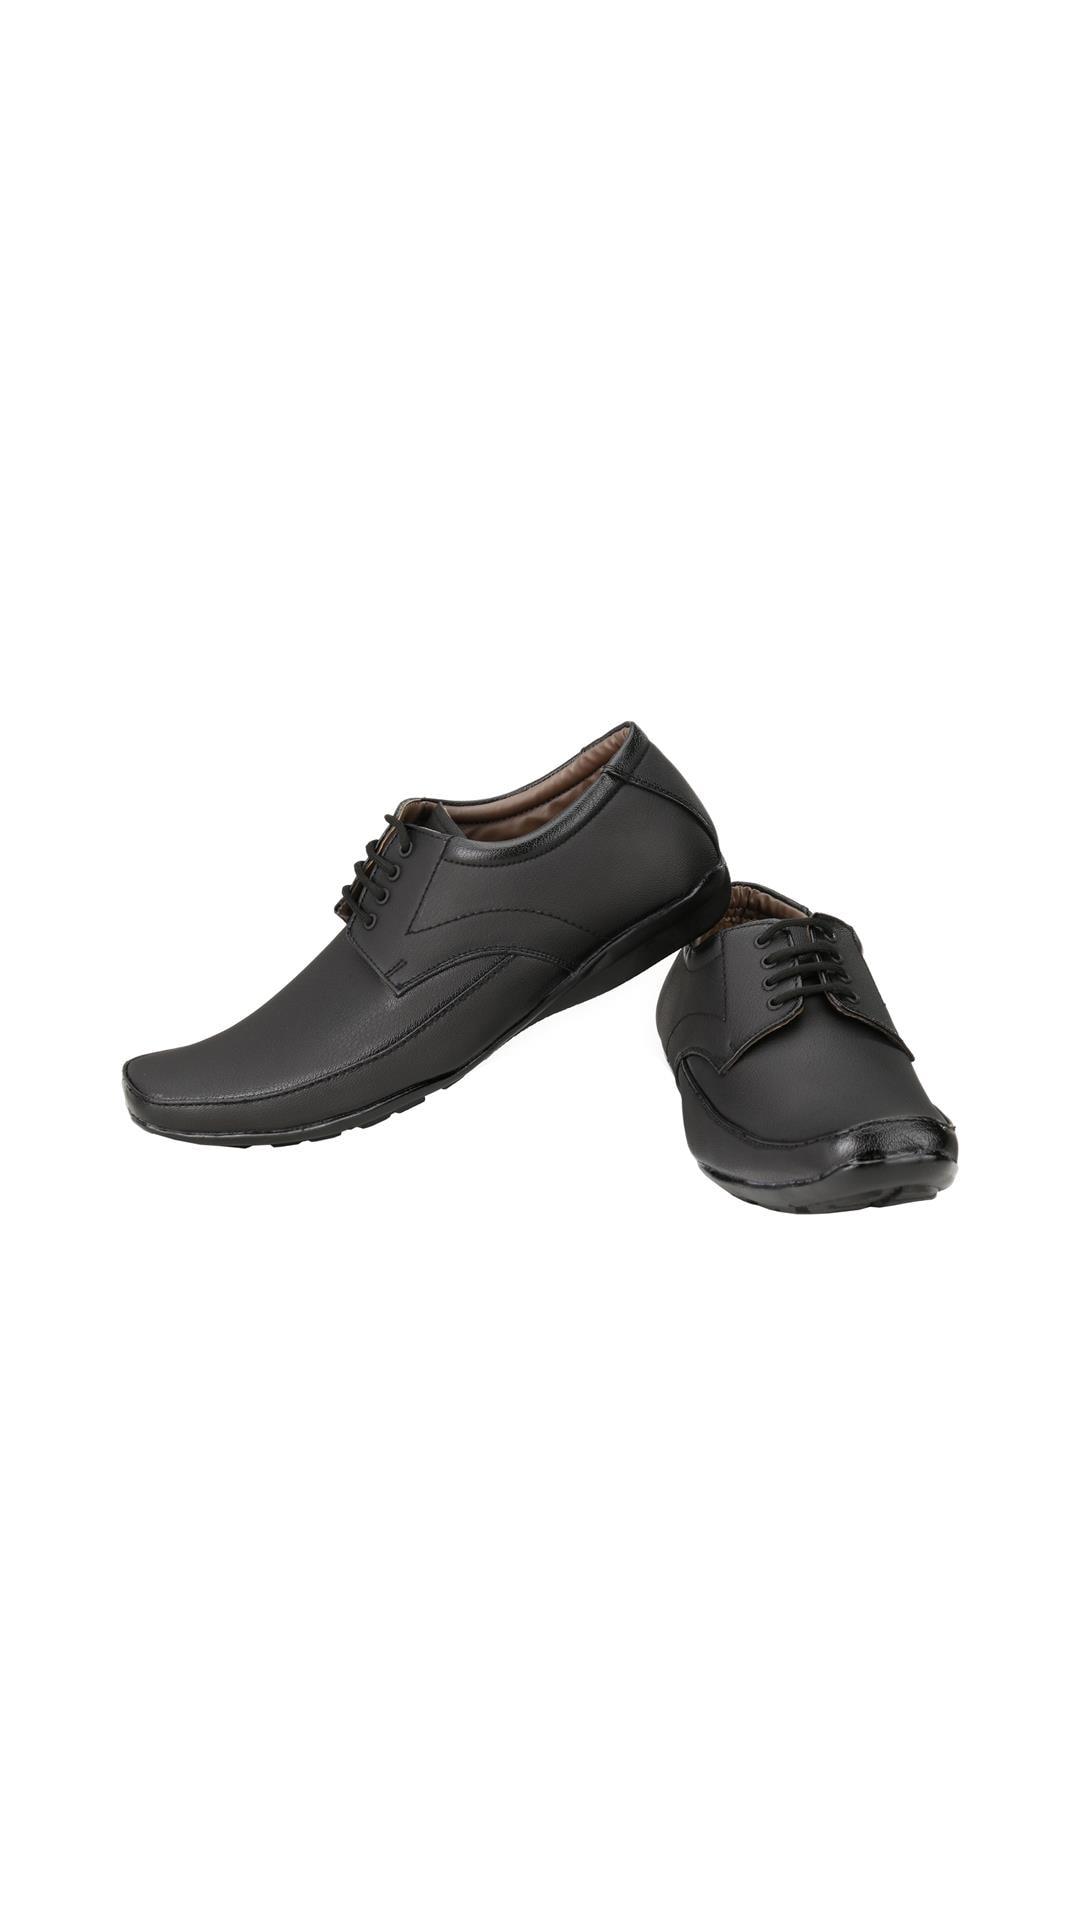 mactree black boots